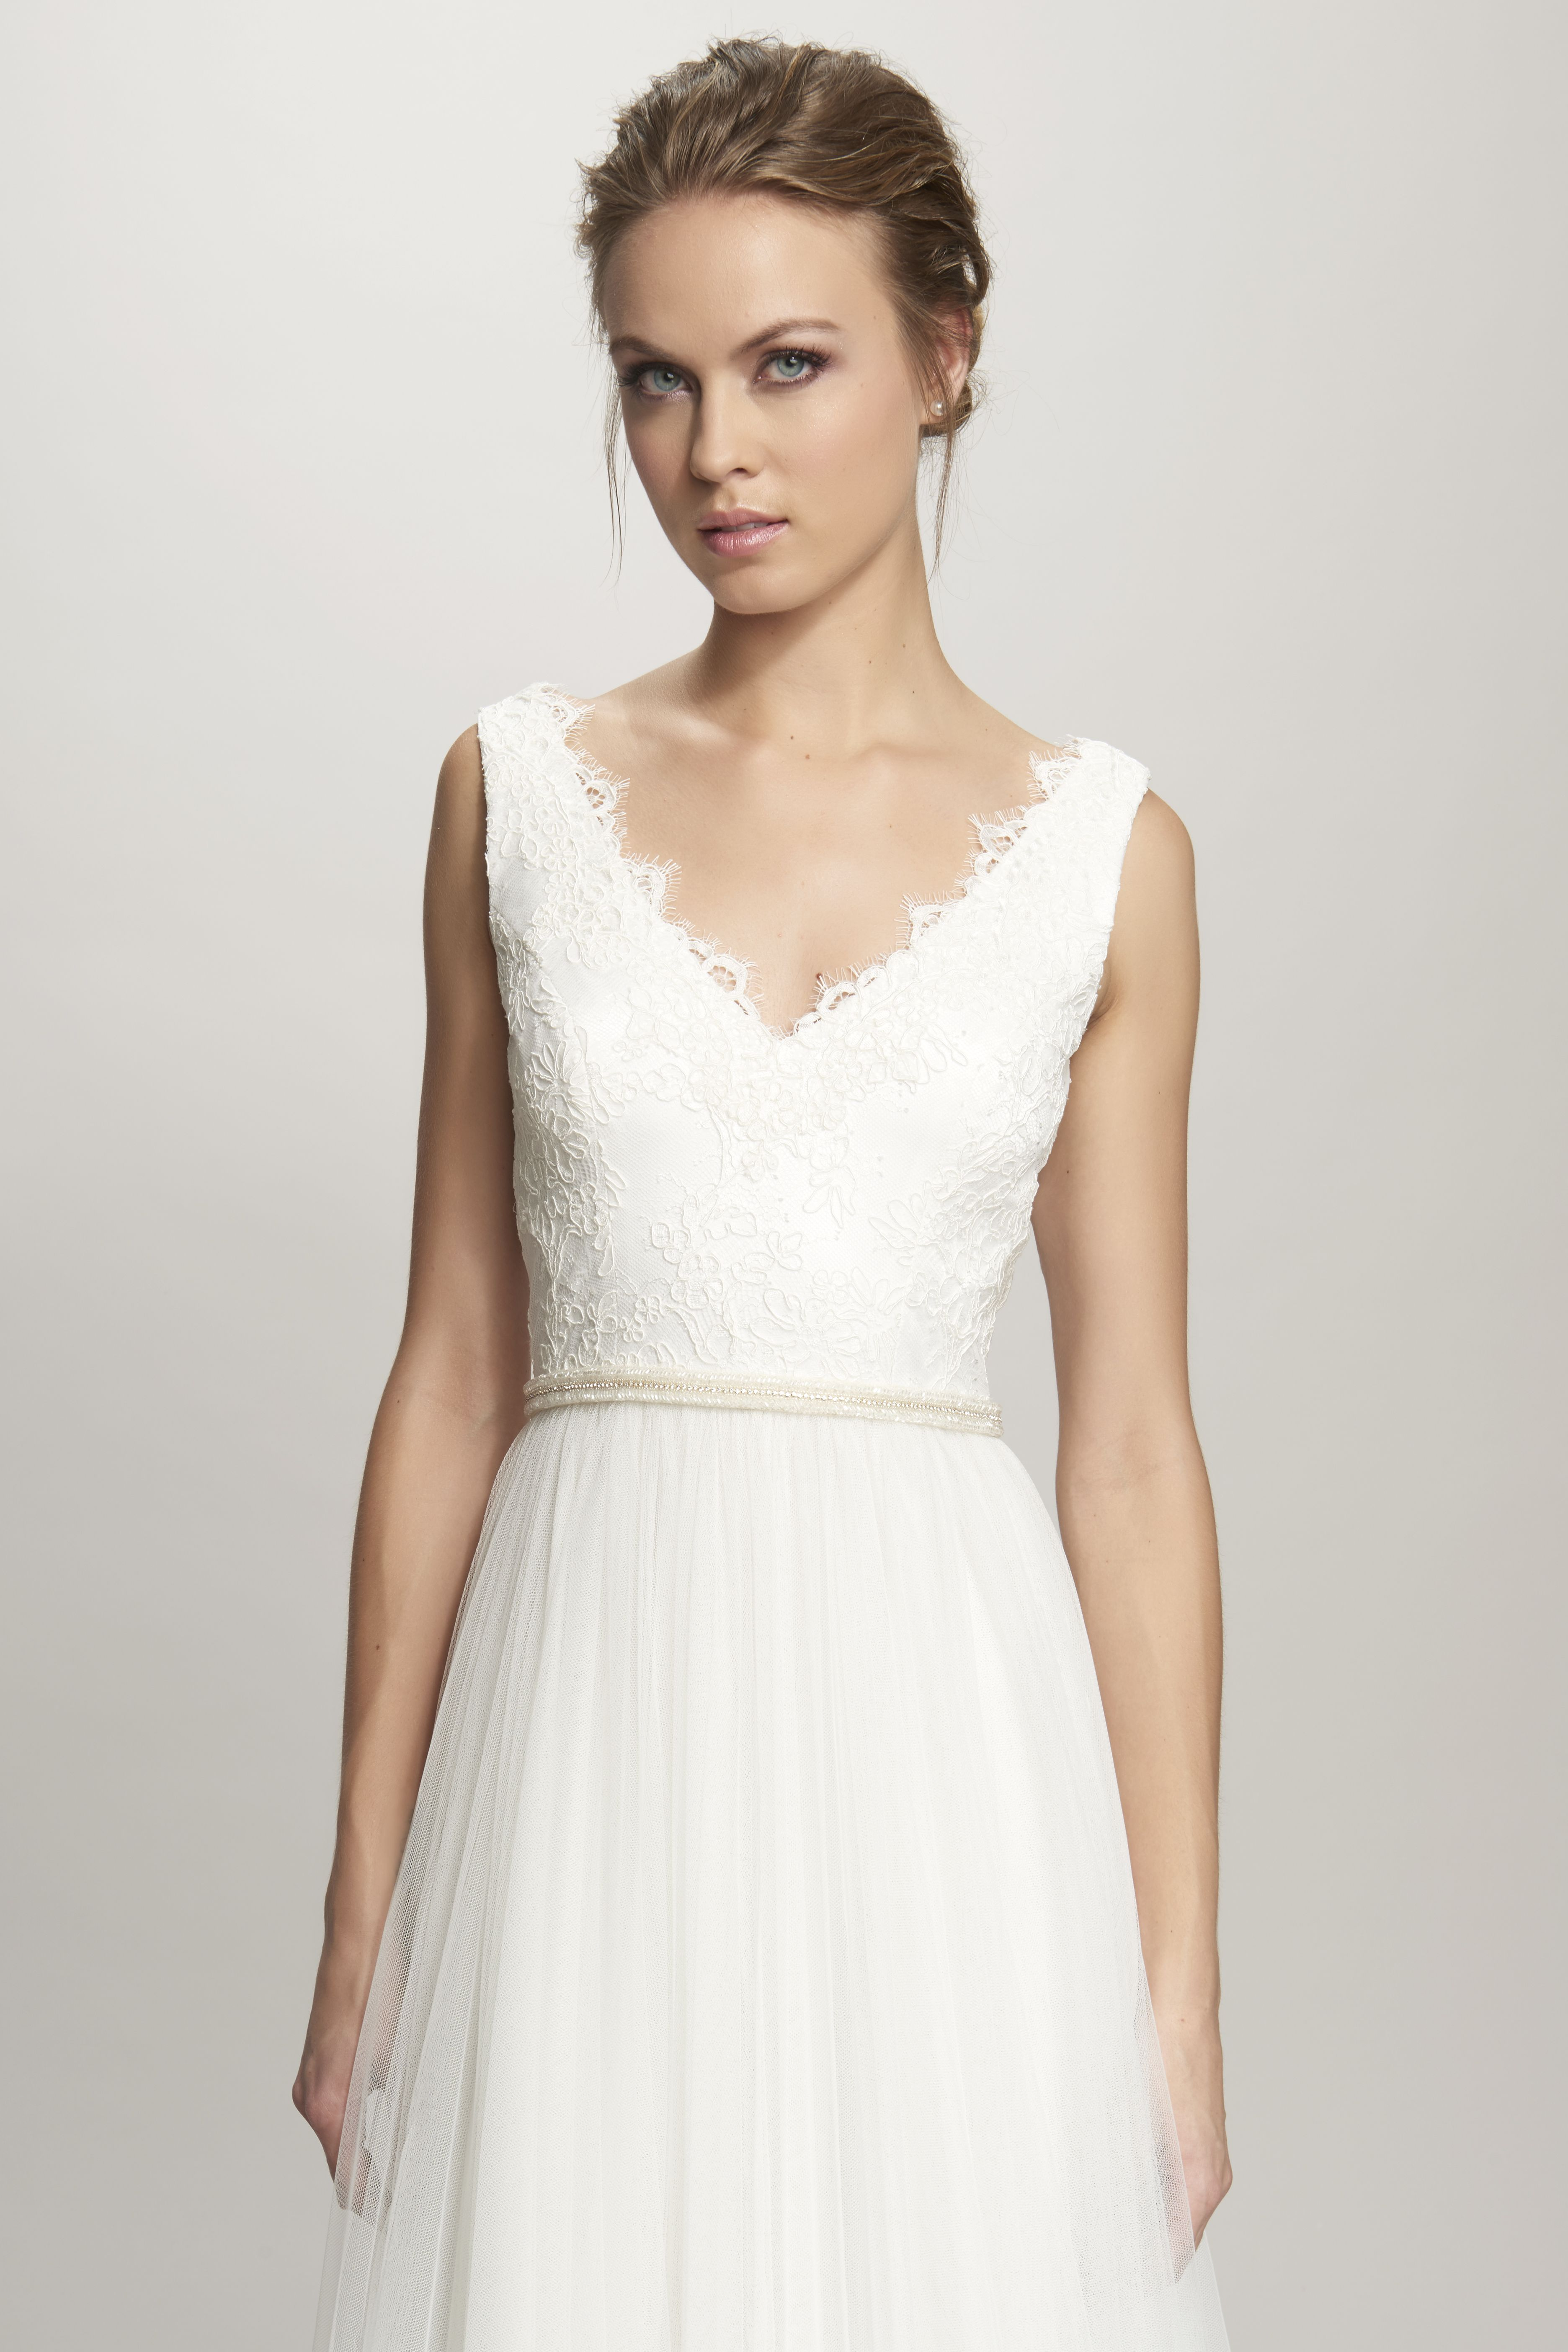 Theia wedding dresses  Khloe Belt Bridal Gown  THEIA Bridal  wedding dresses  Pinterest